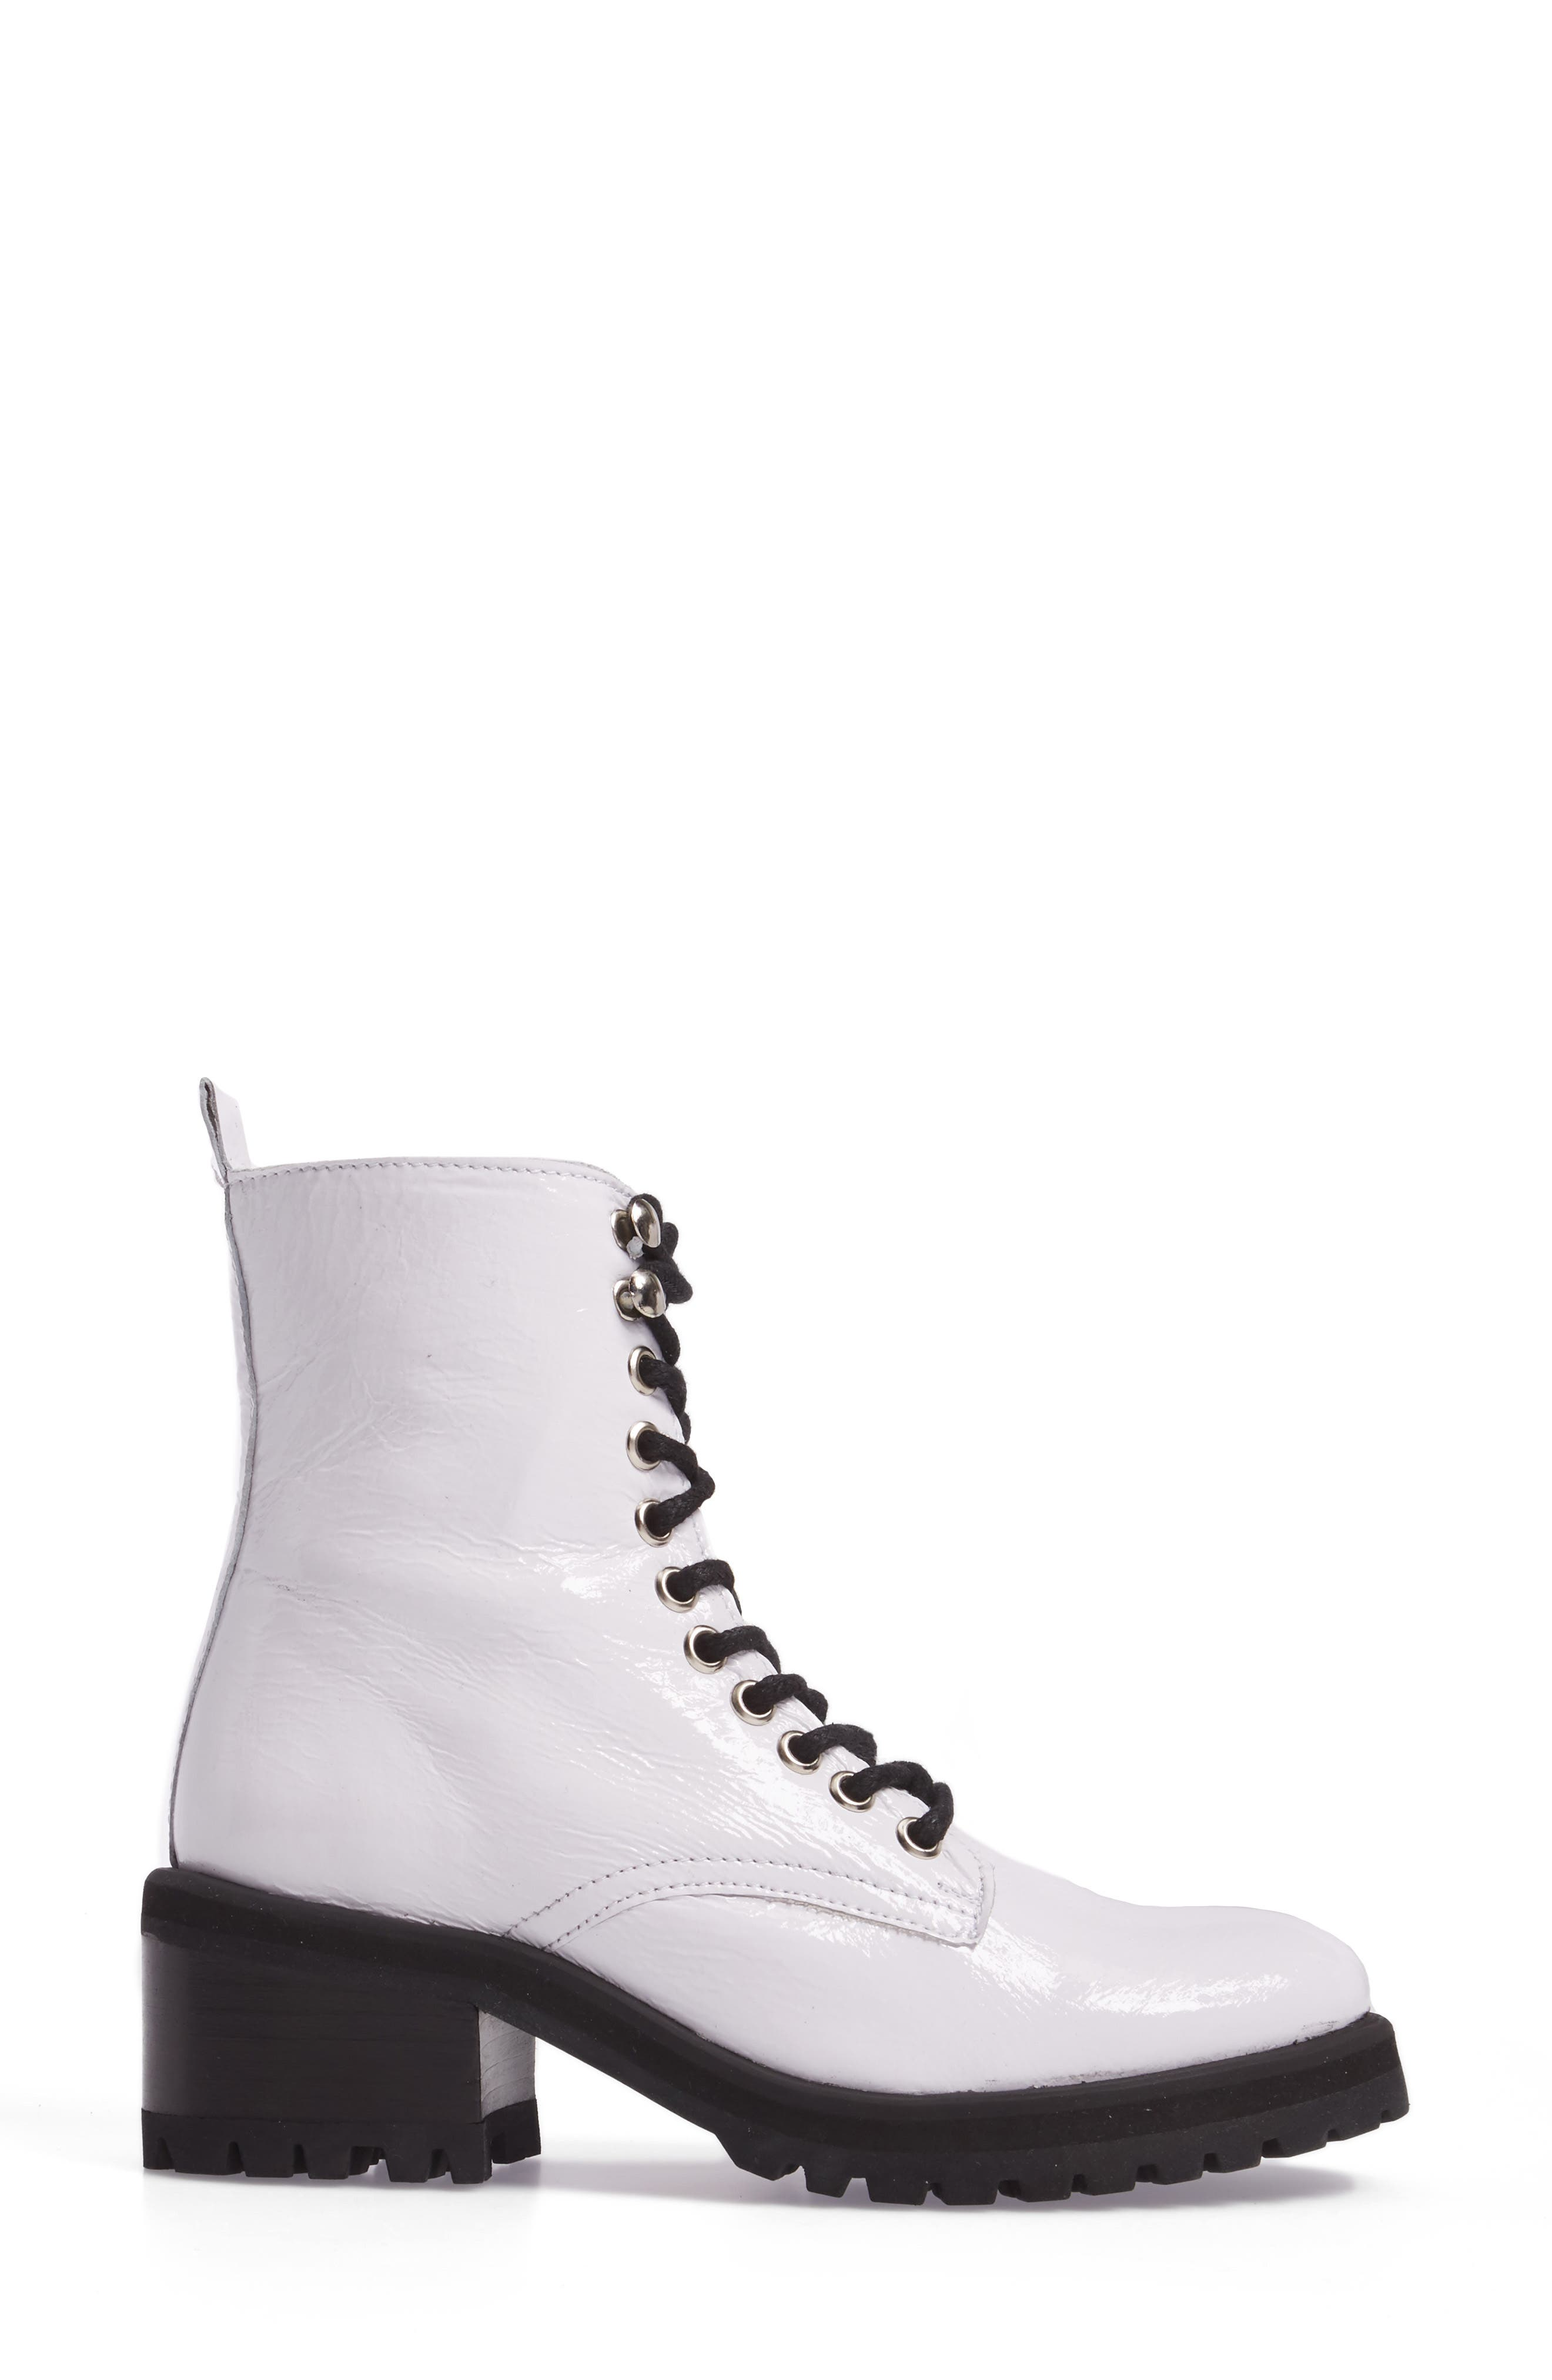 Geneva Bootie,                             Alternate thumbnail 3, color,                             White Patent Leather